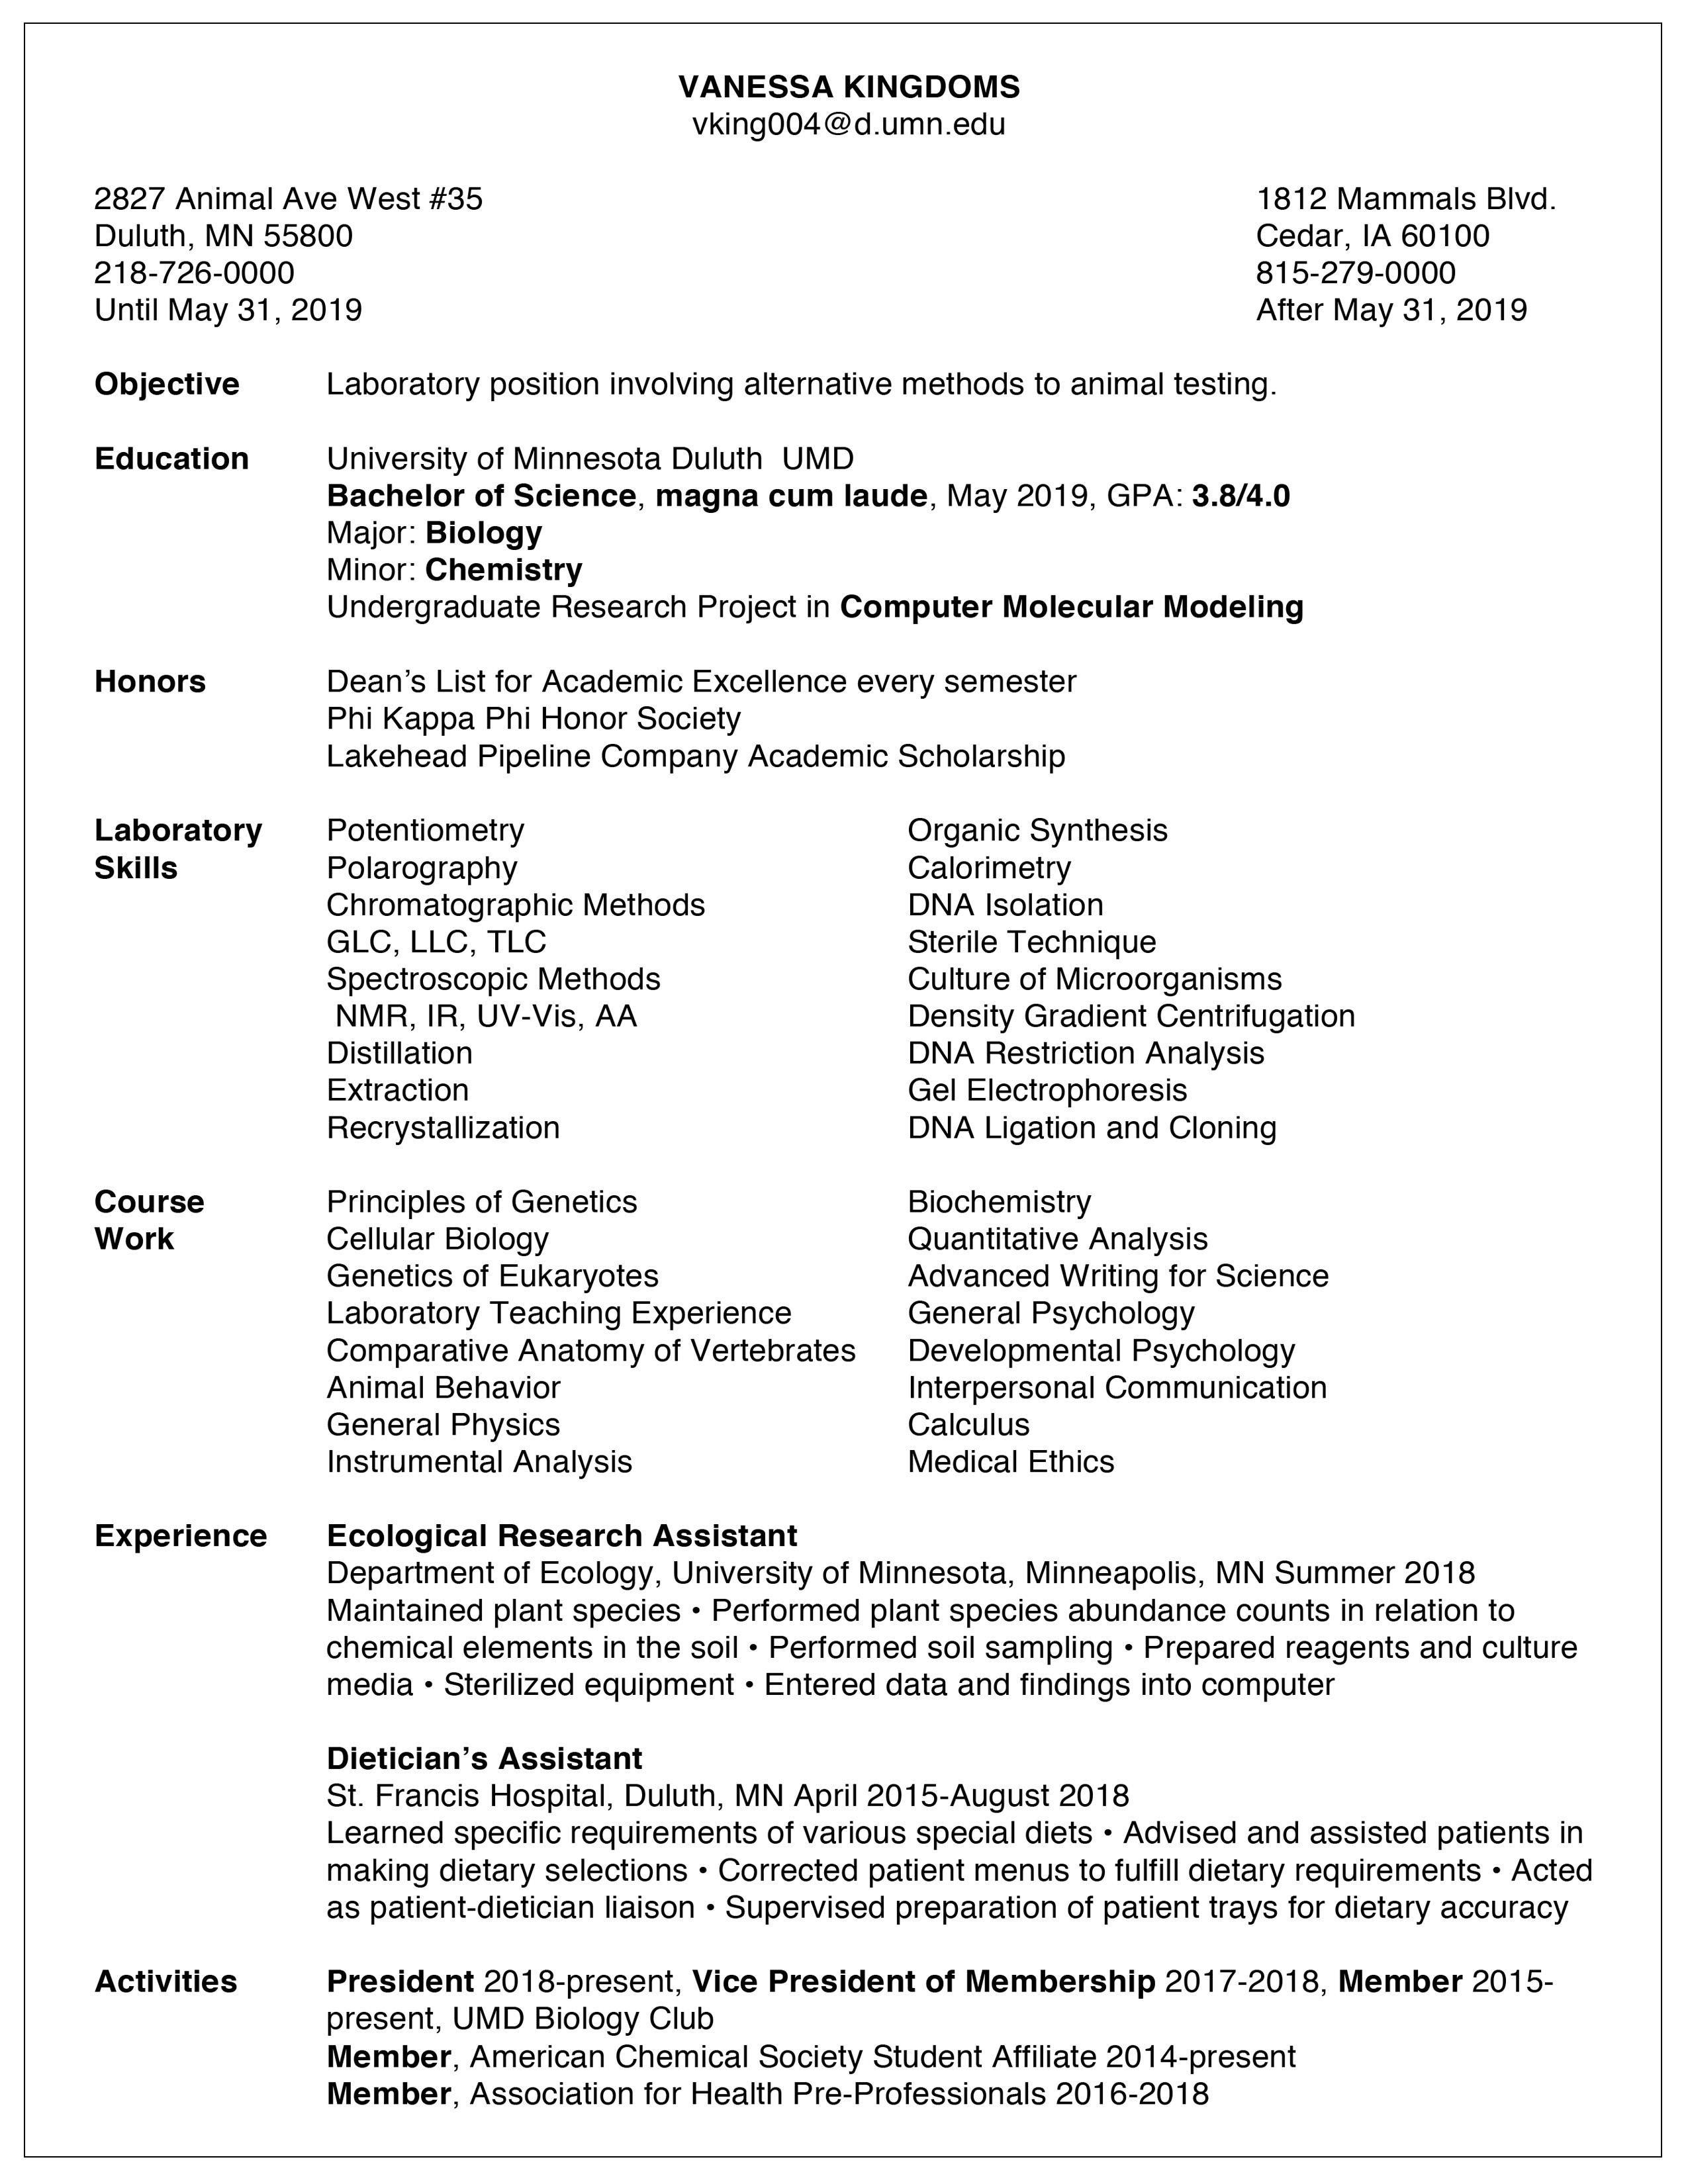 Resume Examples / Career & Internship Services / UMN